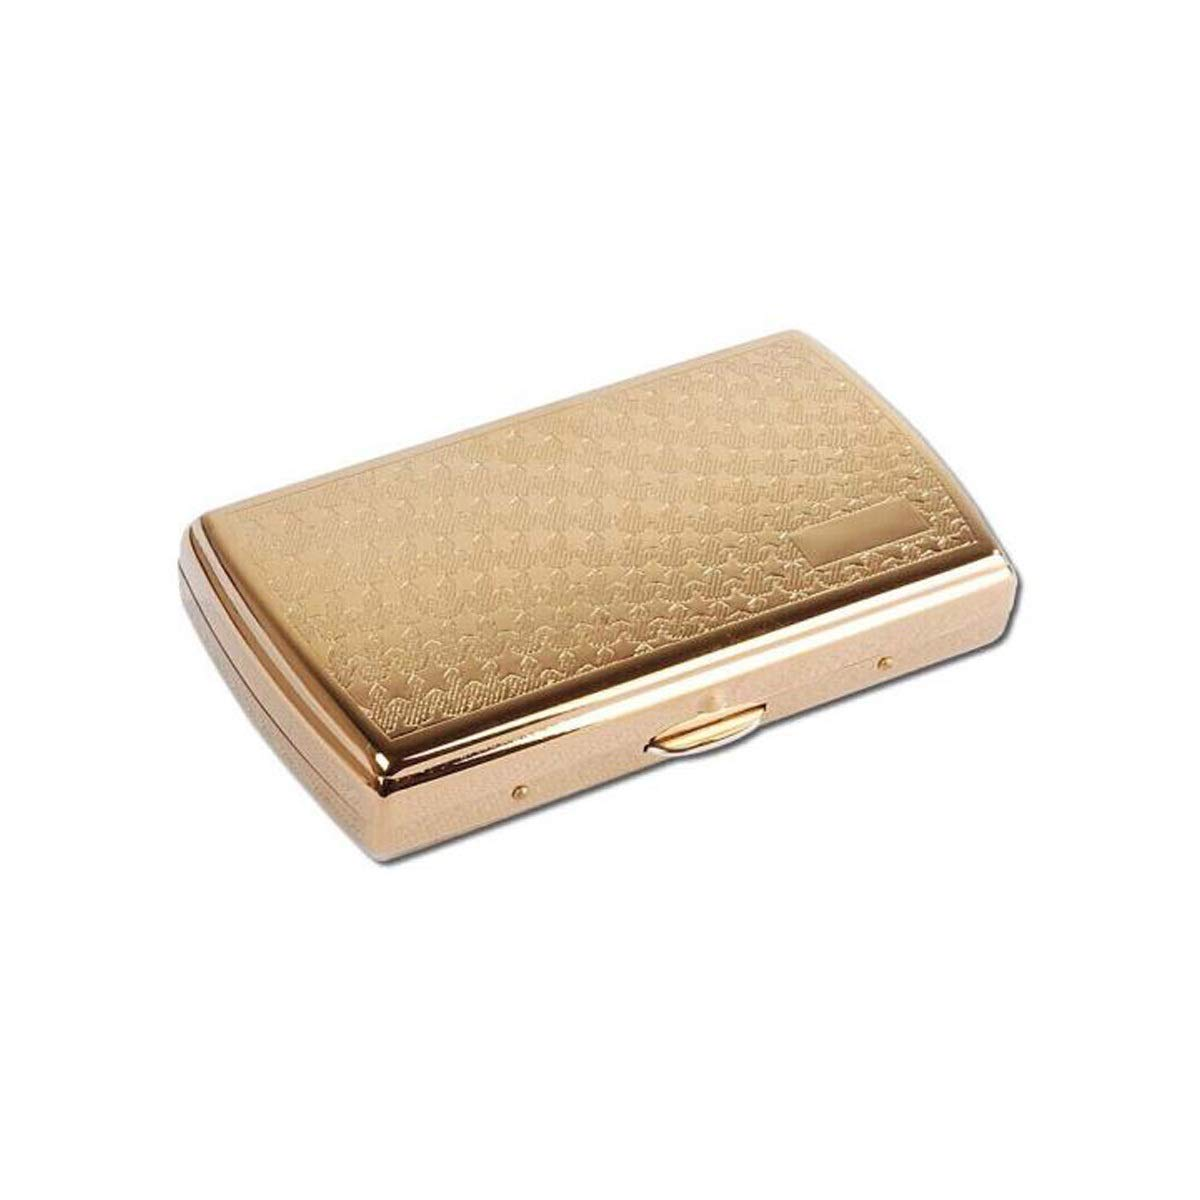 WENPINHUI Cigarette Case, Cigarette Case, 12 Pieces of Cigarette Holder, Copper-Plated Titanium Plating Process (Color : Gold, Style : A) by WENPINHUI